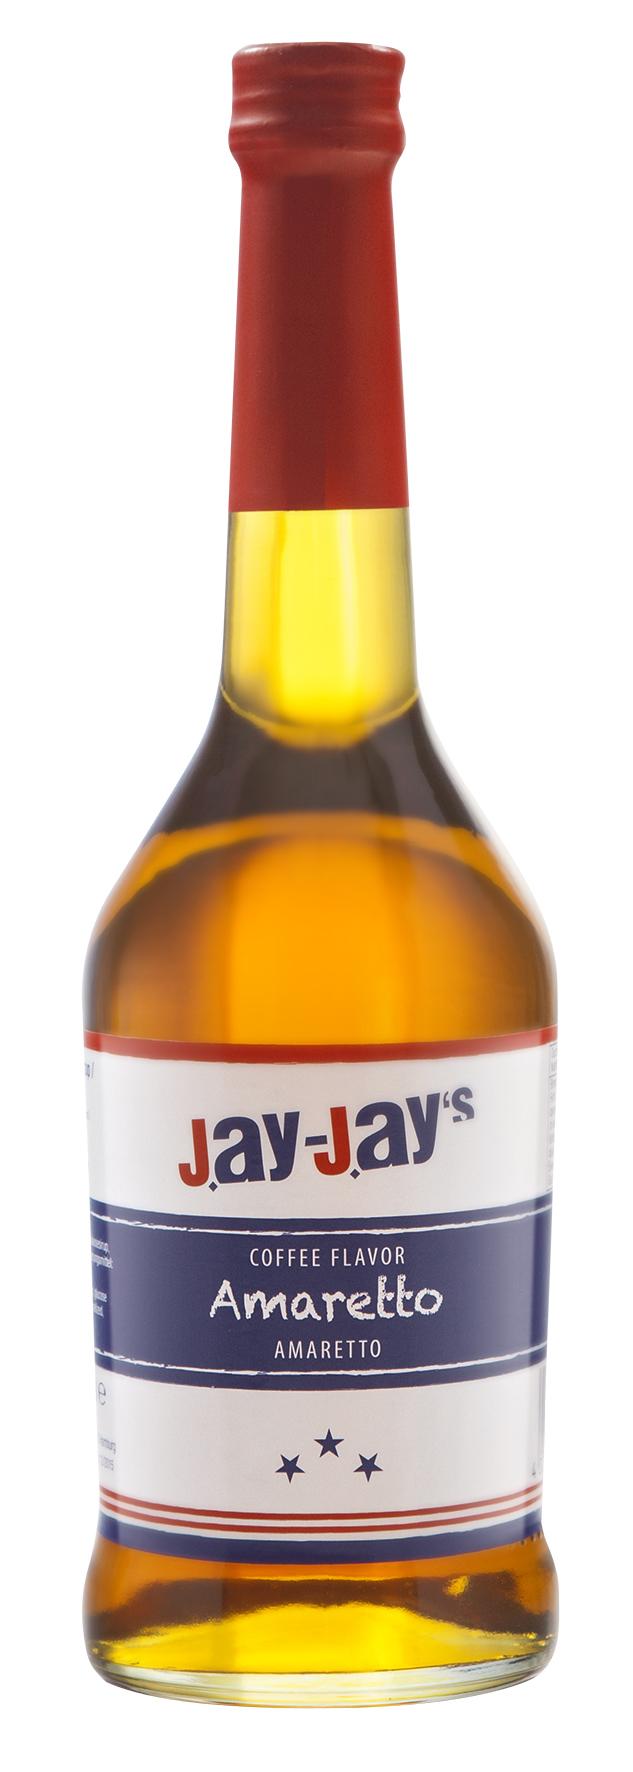 jay-jay-s-coffee-flavor-amaretto-500-ml